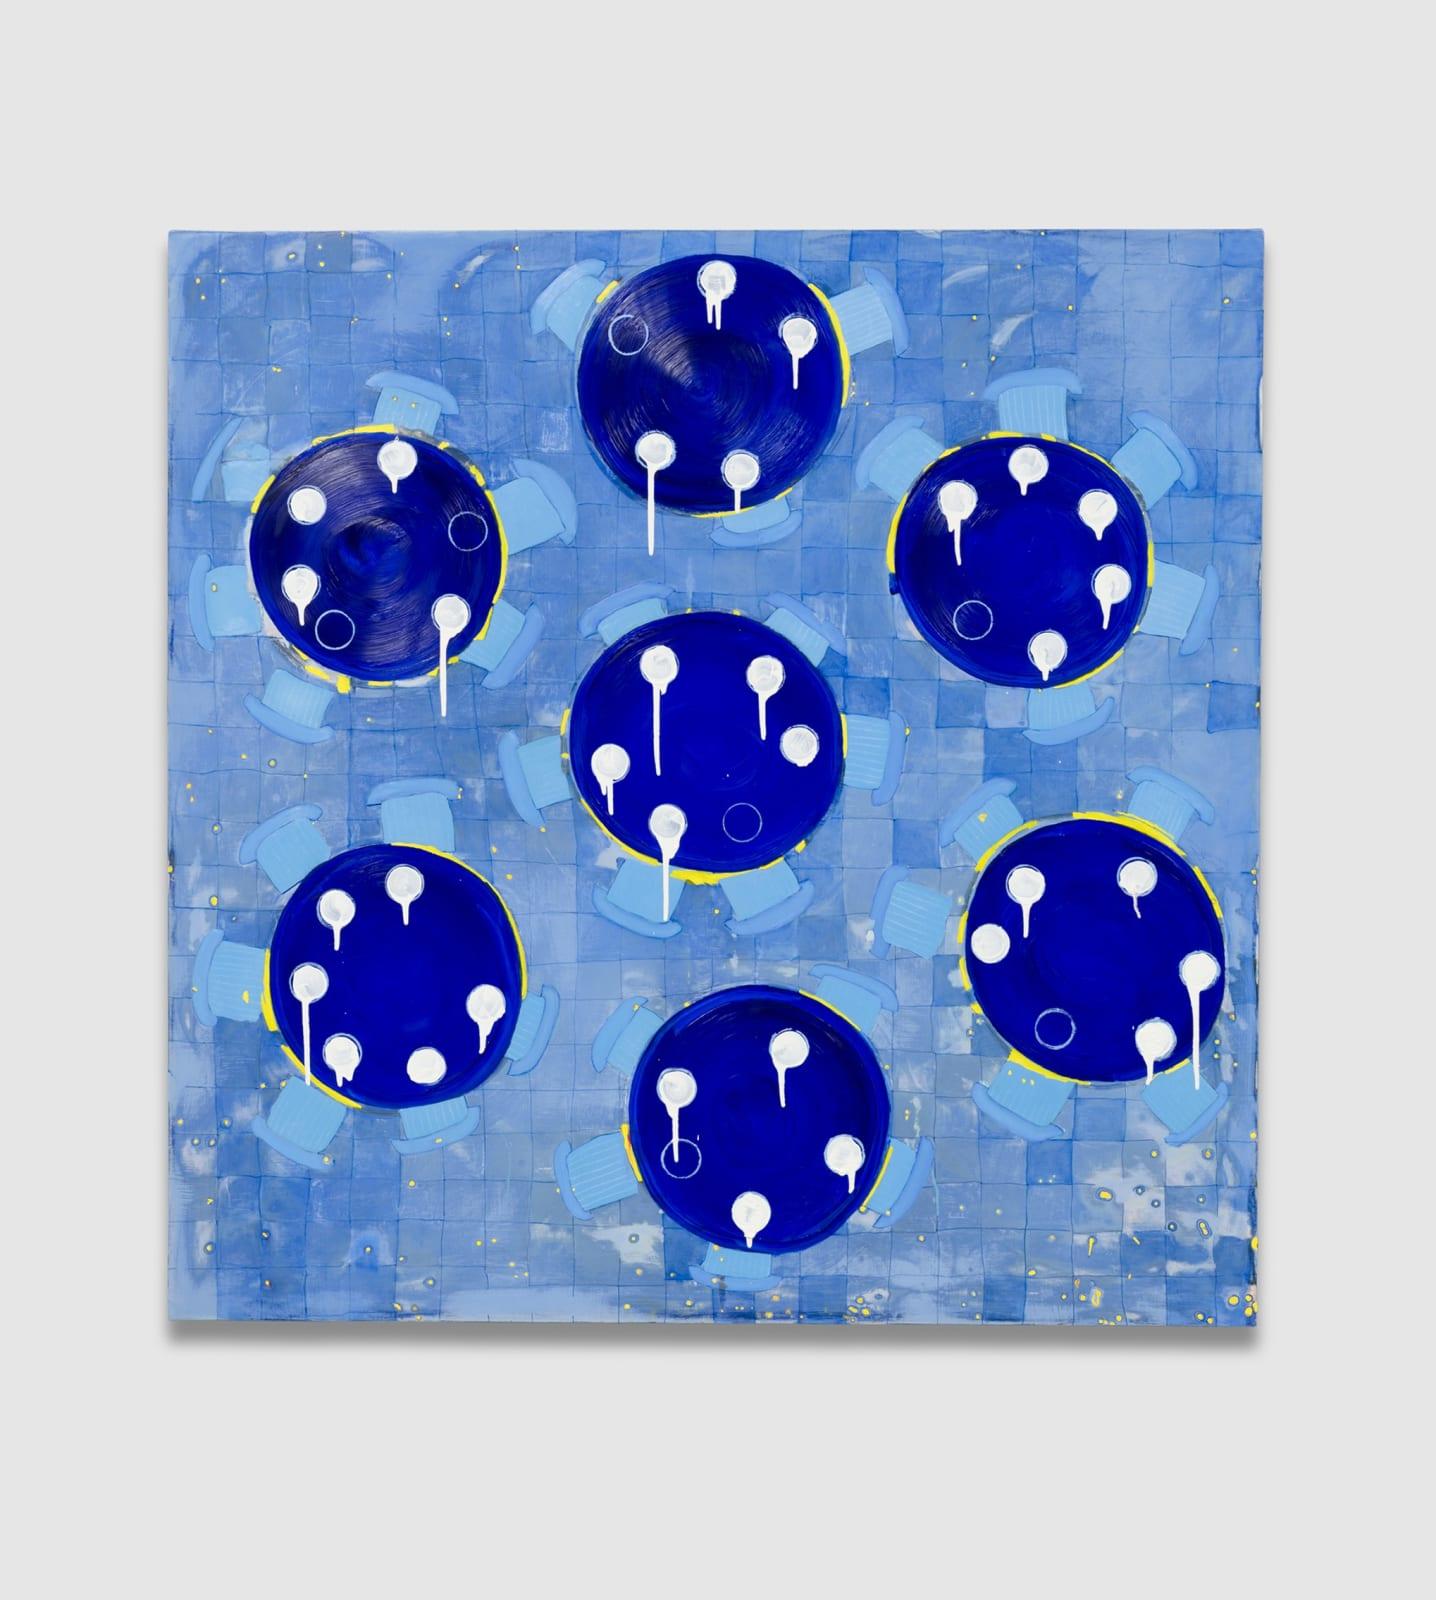 Kim Dingle Help Wanted - Restaurant Mandala, 2012/2020 Oil on canvas 48 x 48 in (121.9 x 121.9 cm)